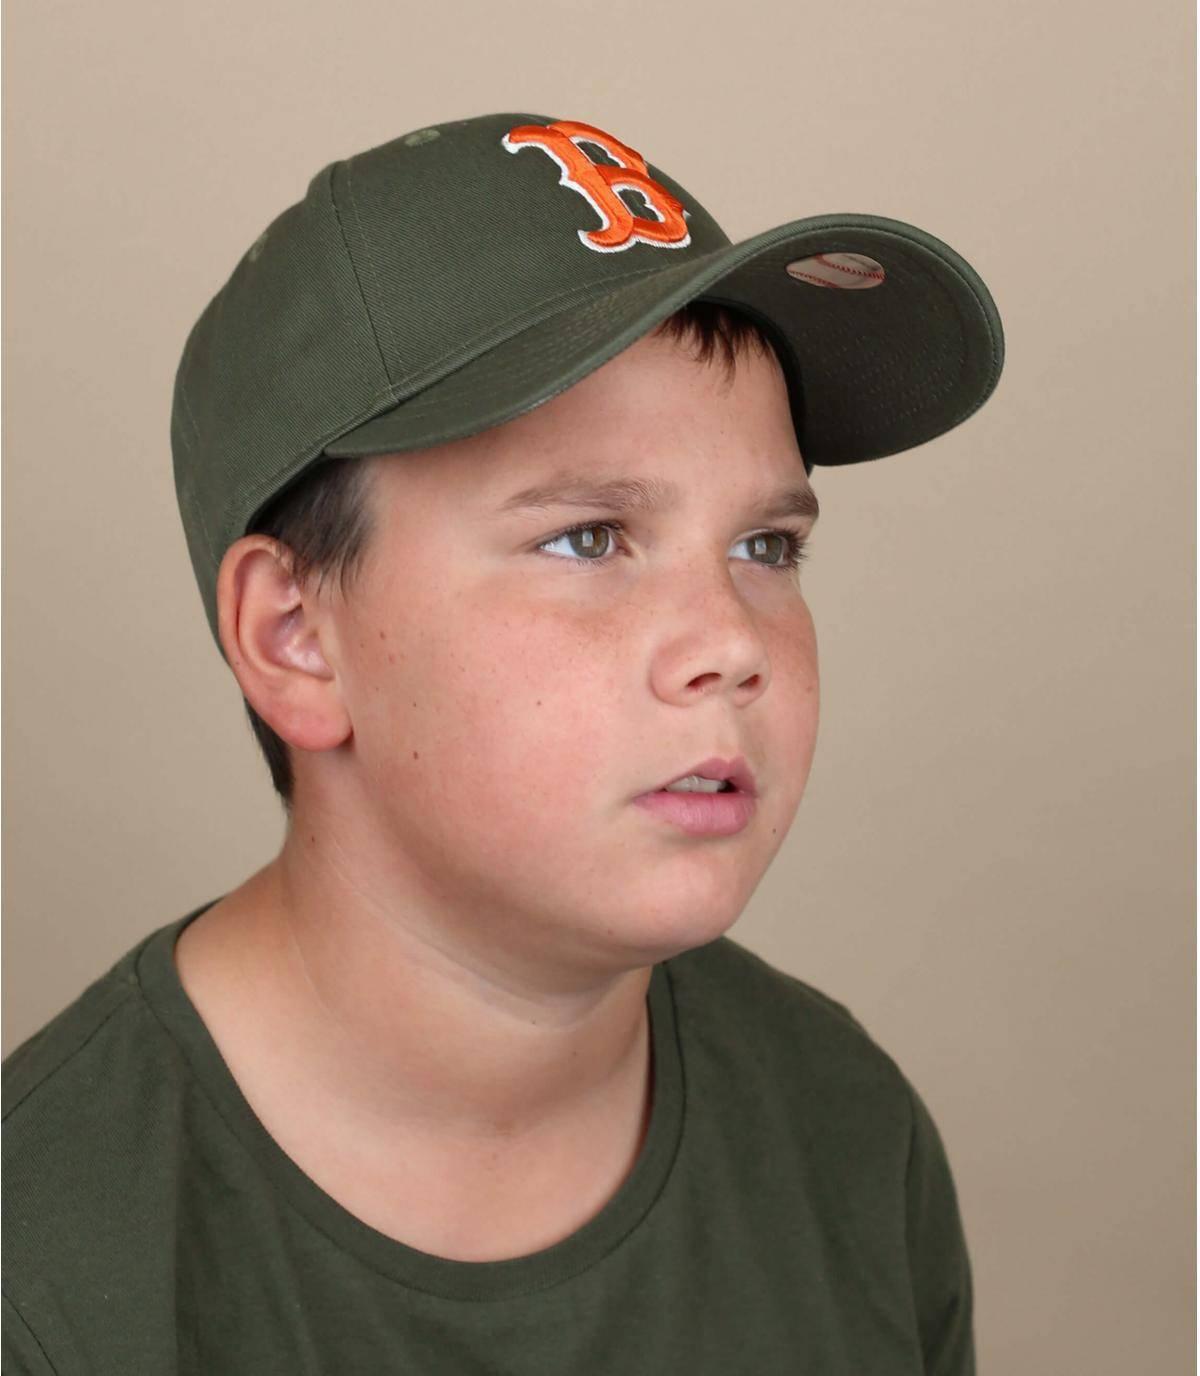 gorra niño B verde